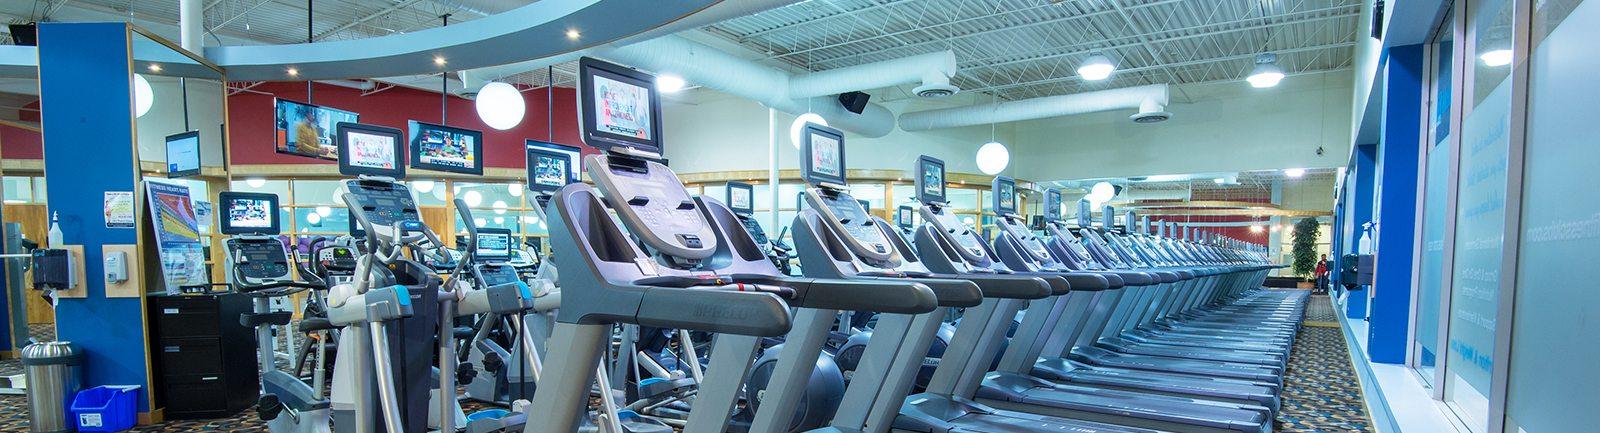 wfcc-slider-treadmills